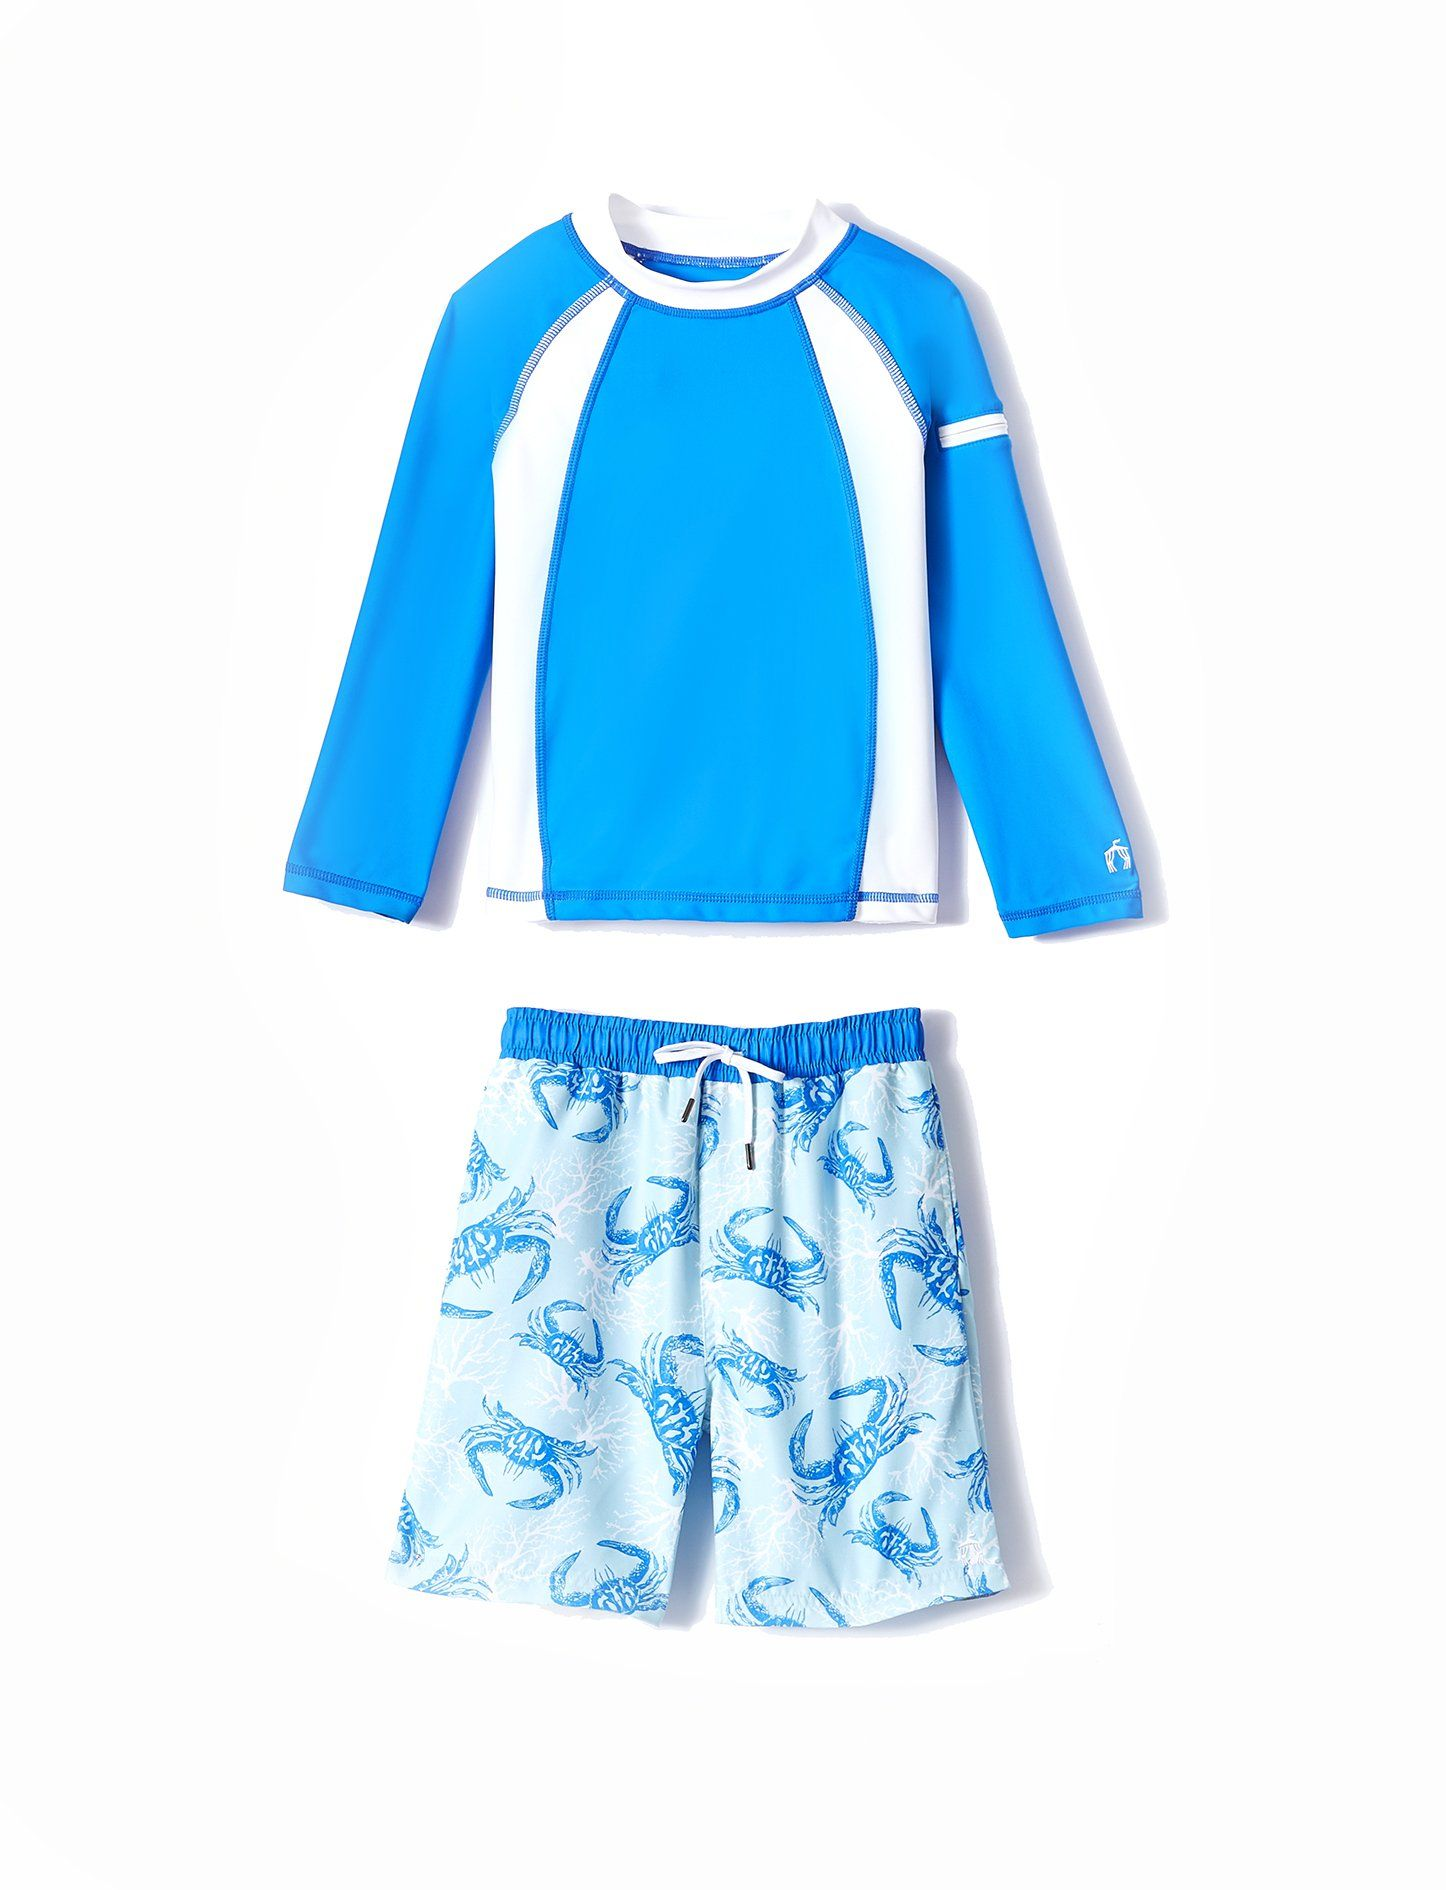 Cabana Life-Boys Blue Crabs Rashguard Set, 50+ UV Protection